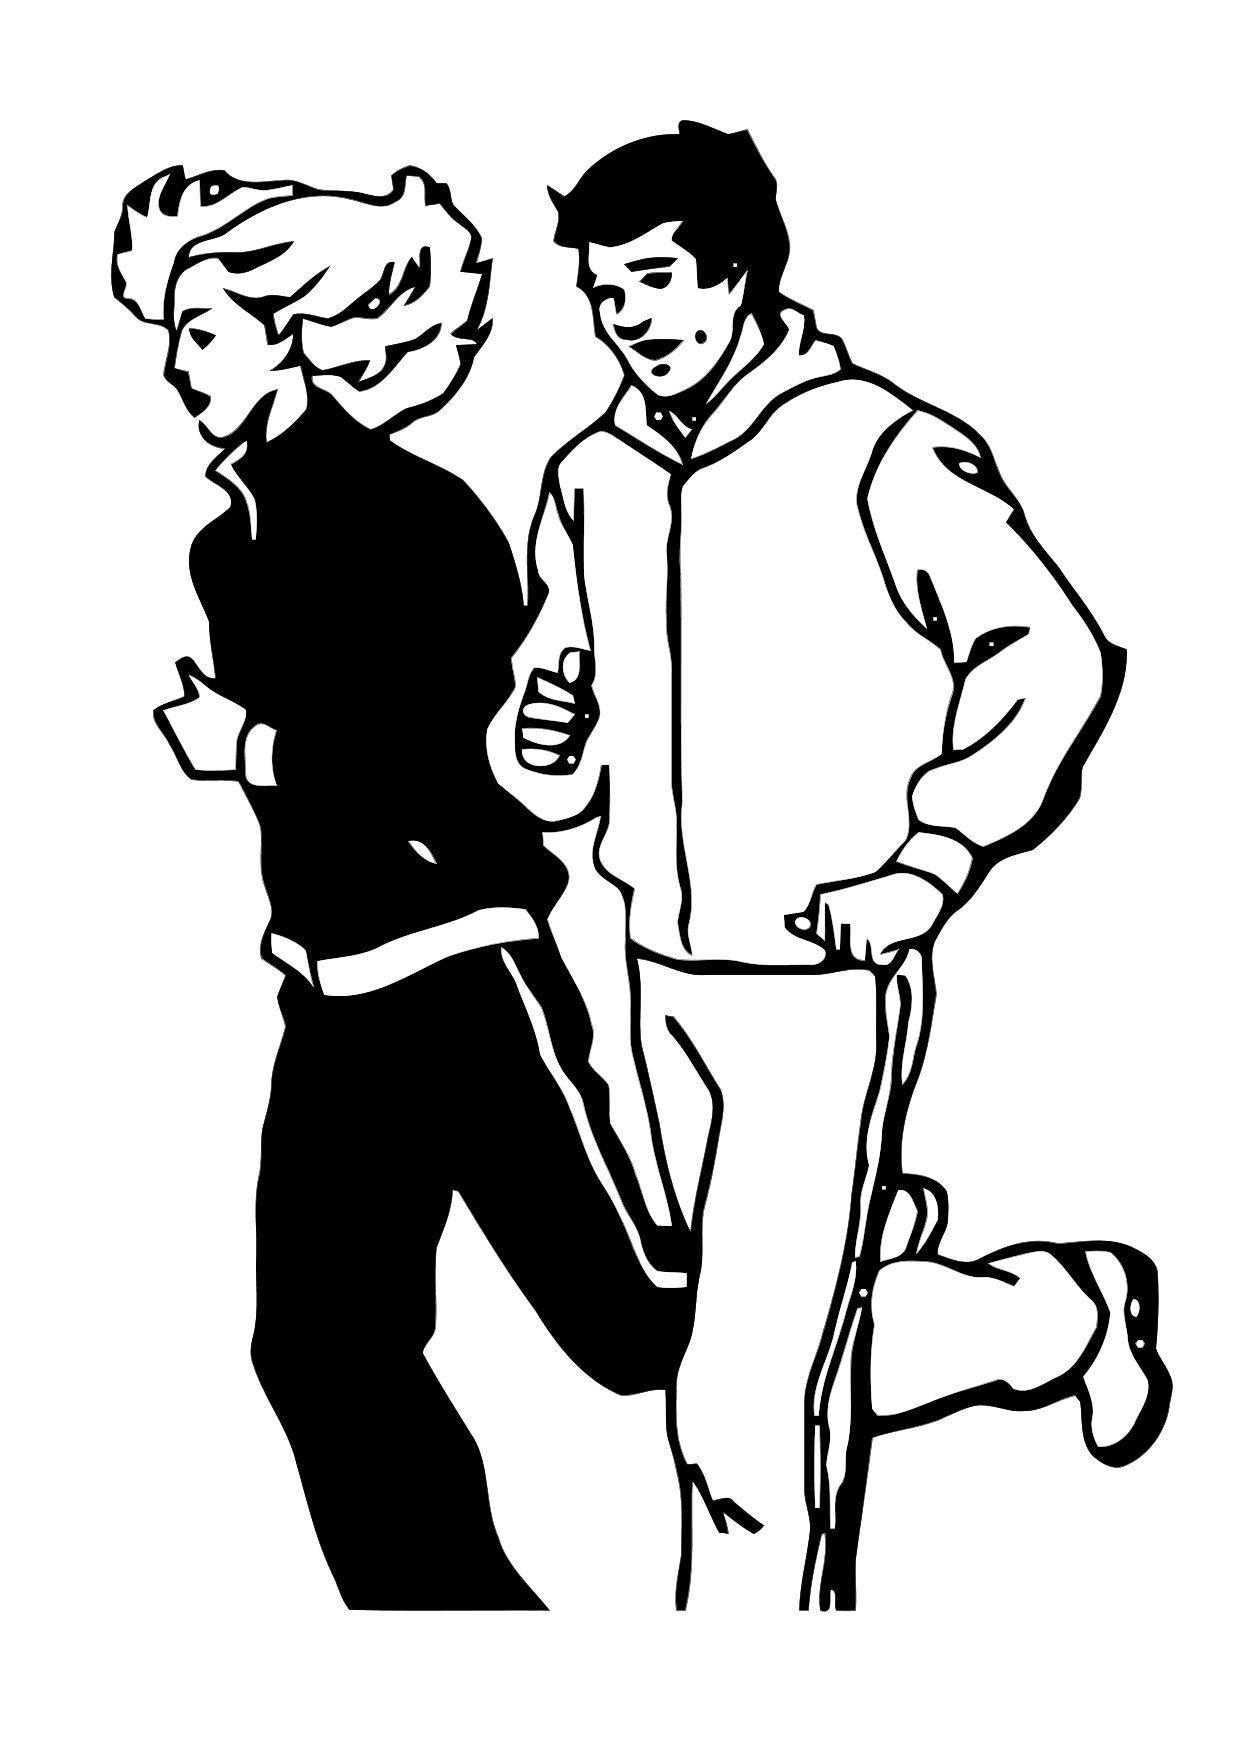 Dibujo para colorear Hacer jogging - Img 11860